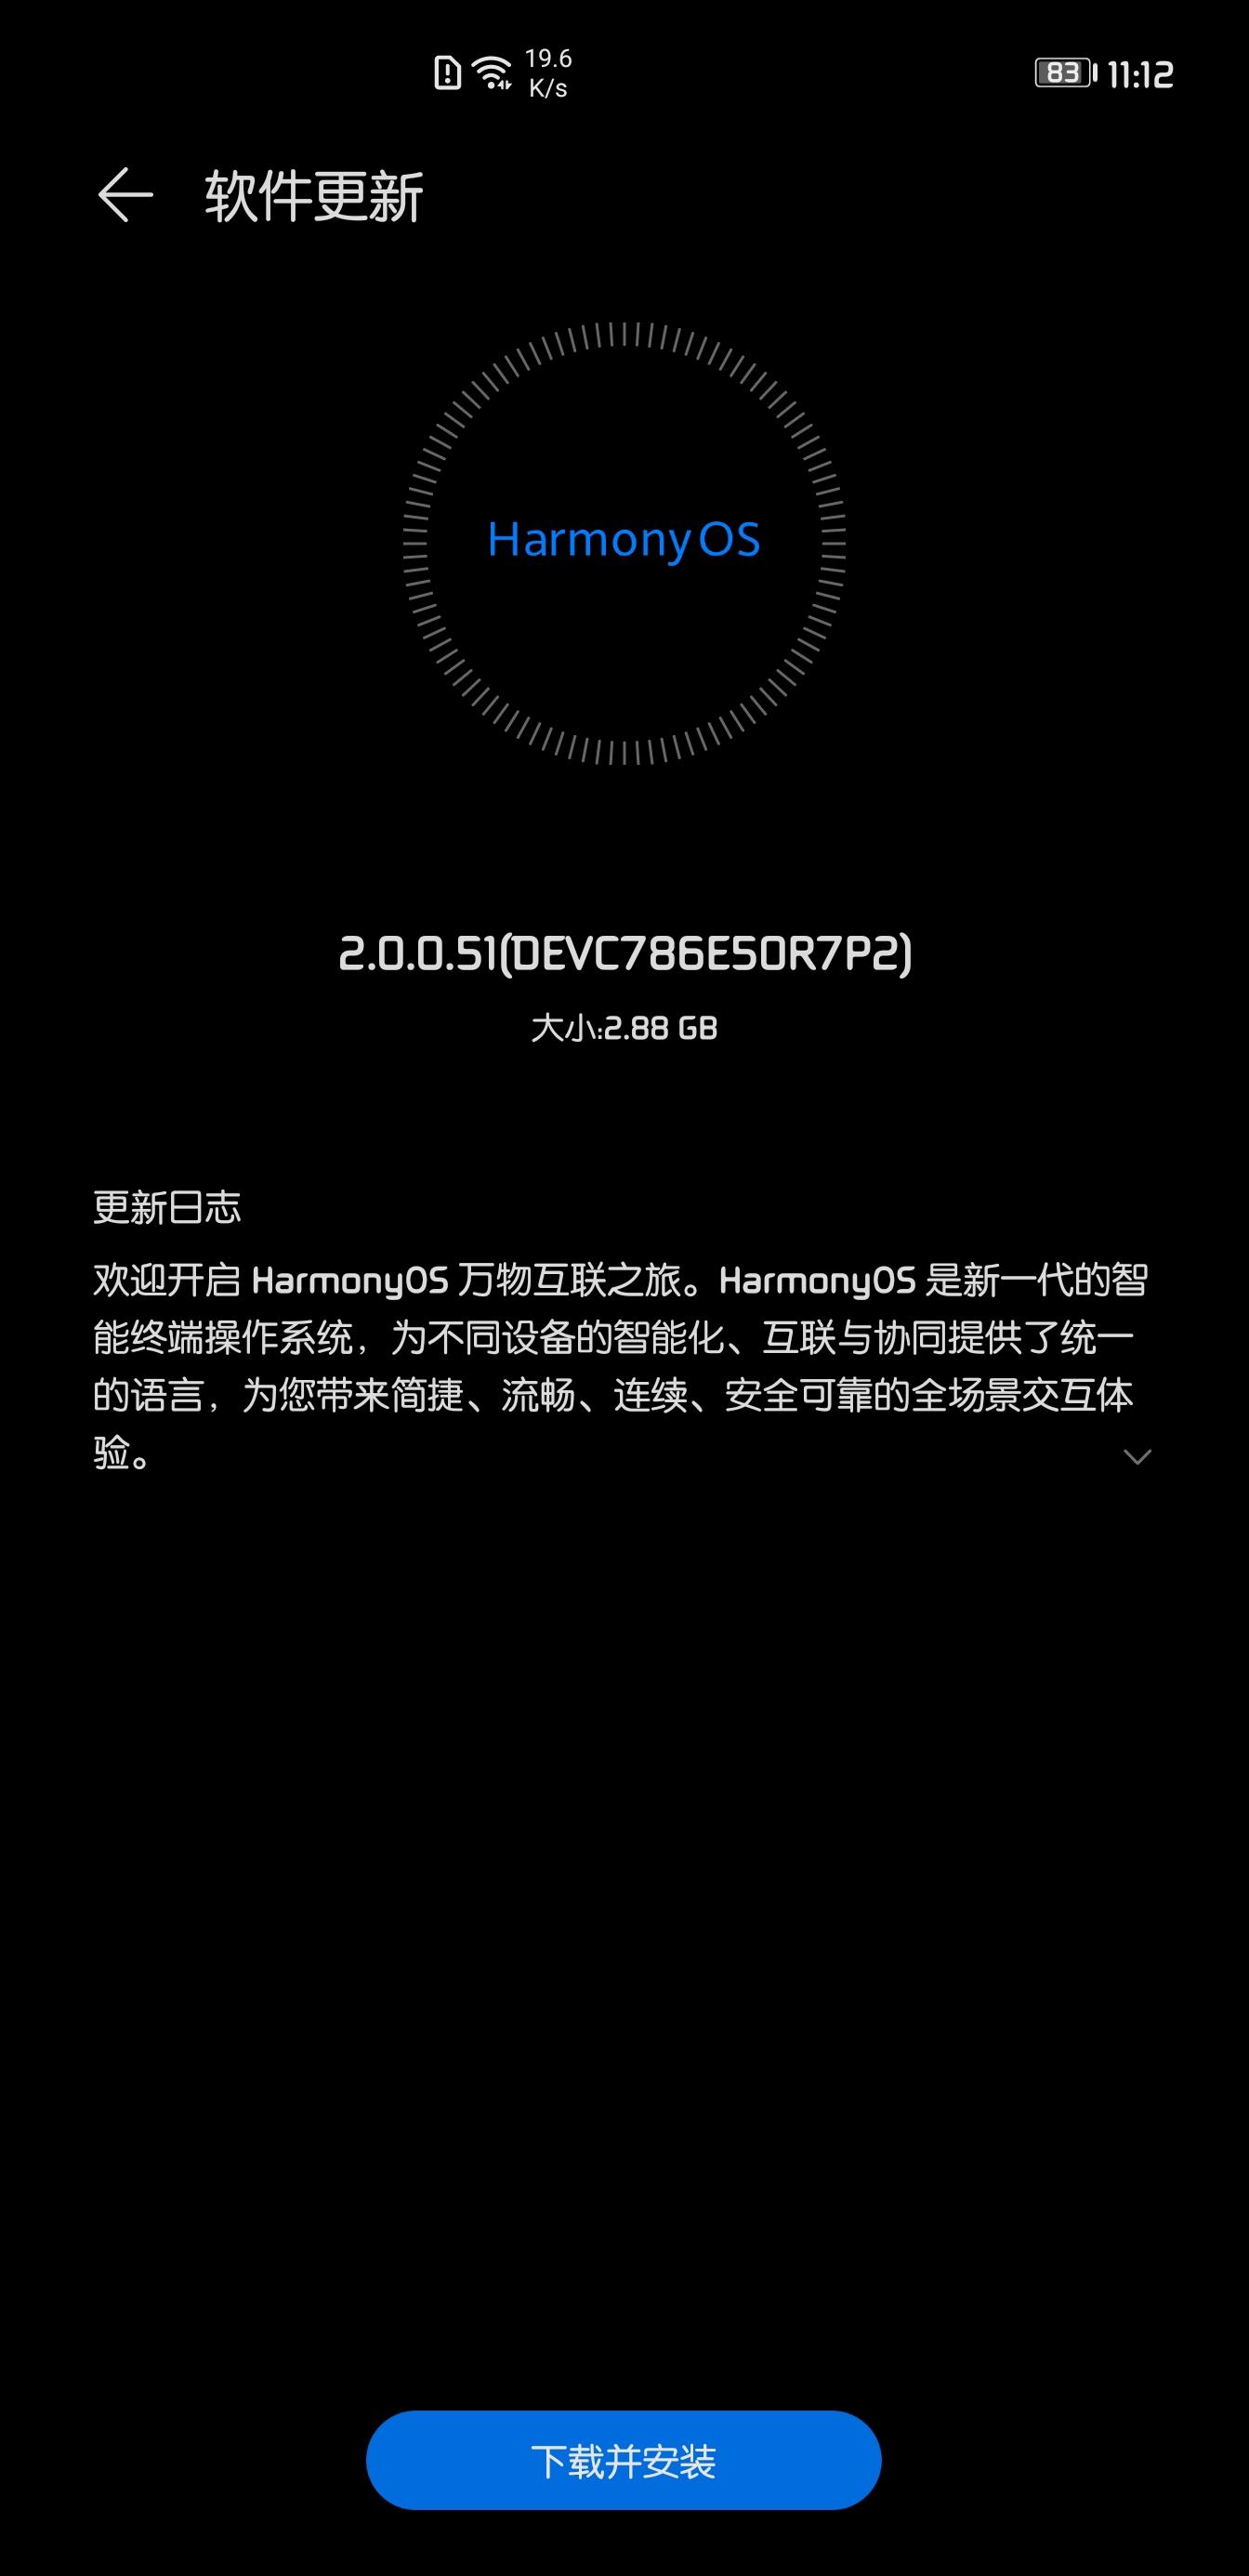 Screenshot_20210506_231225_com.huawei.android.hwouc.jpg